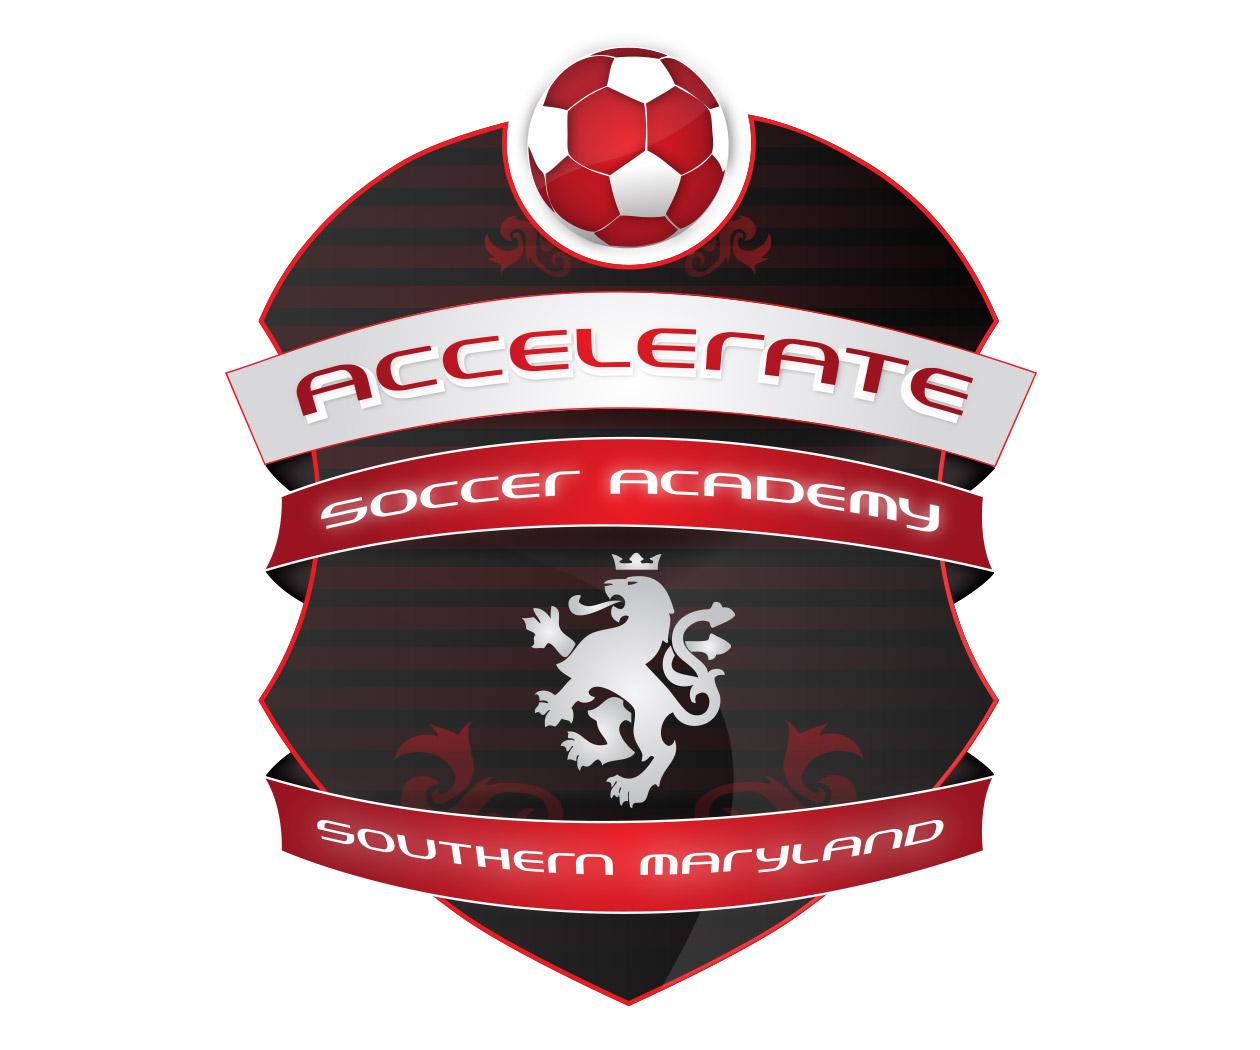 custom soccer logo design accelerate soccer academy by jordan fretz design